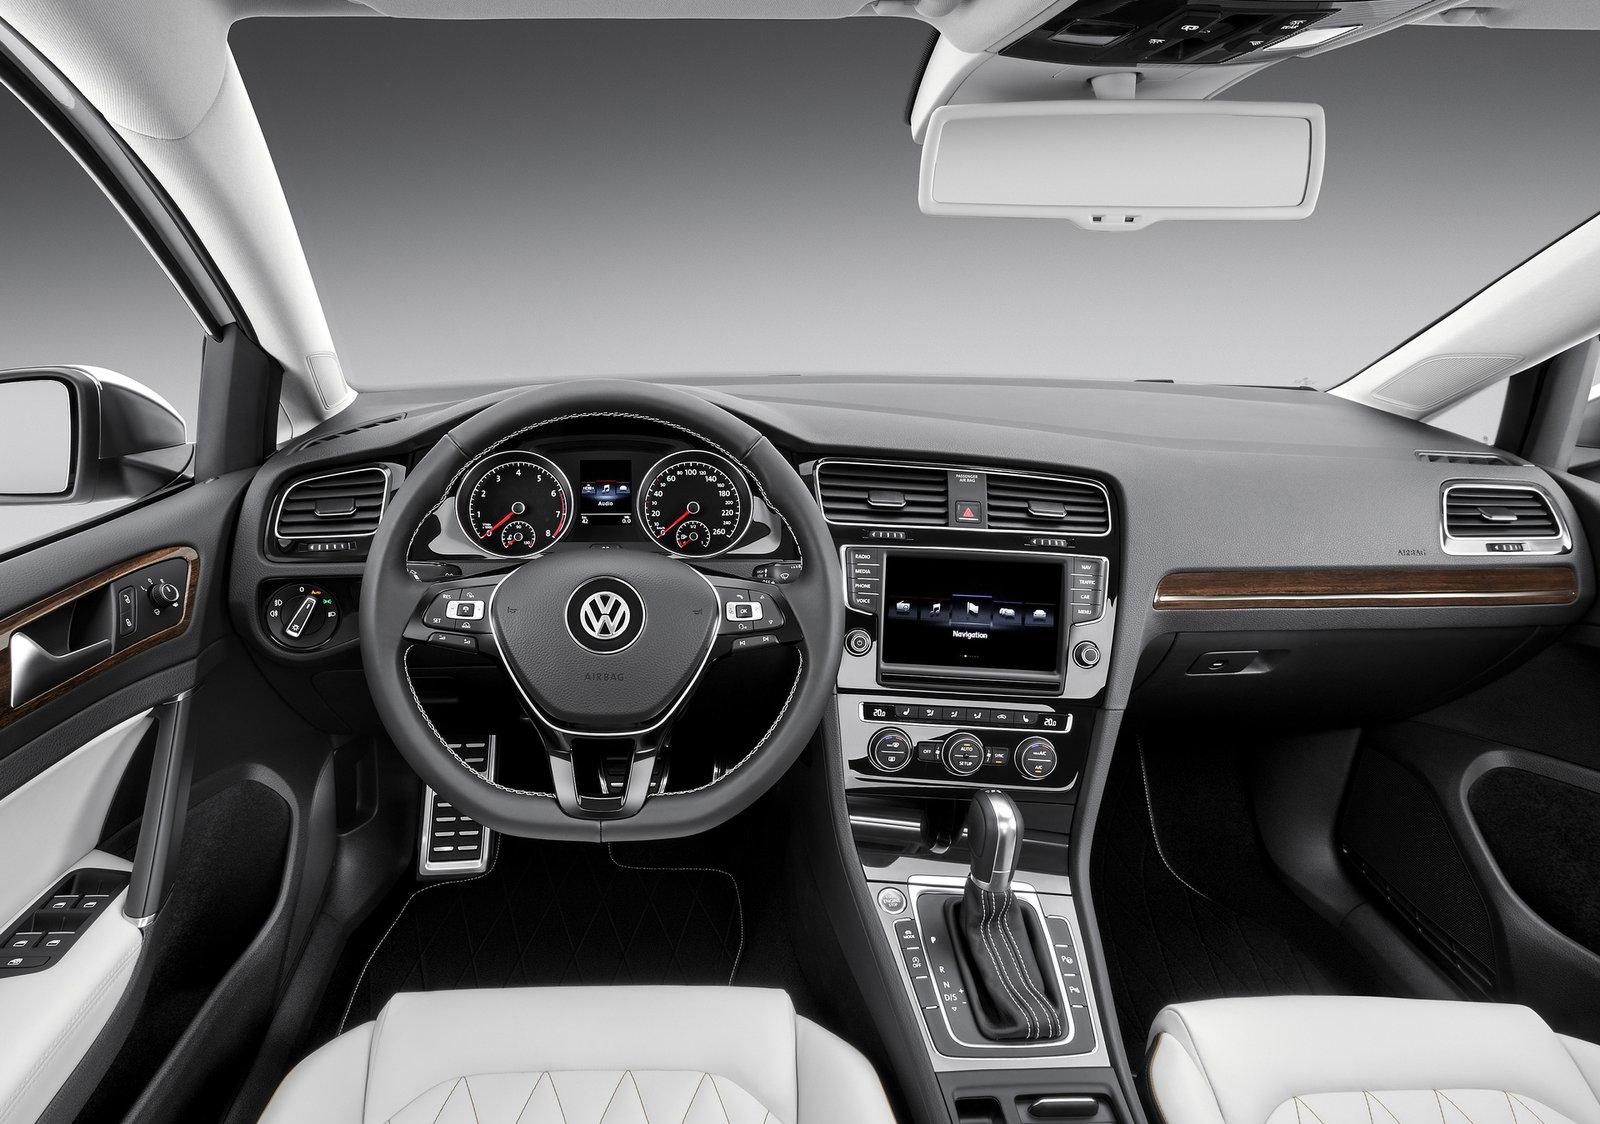 volkswagen_new_midsize_coupe_concept_05